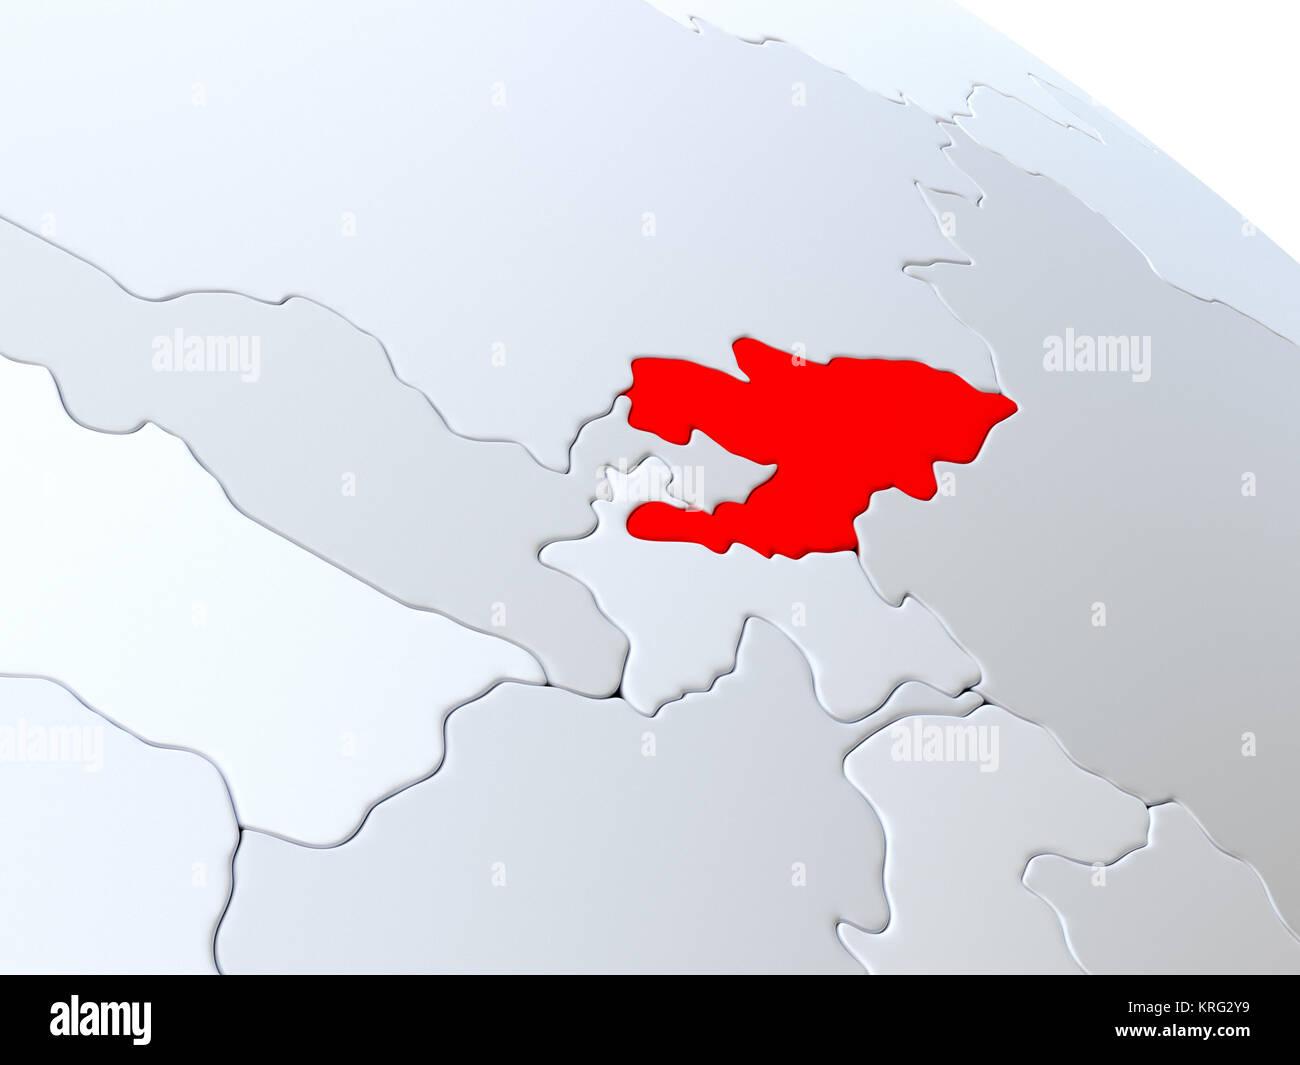 Kyrgyzstan on world map stock photo 169383965 alamy kyrgyzstan on world map gumiabroncs Image collections